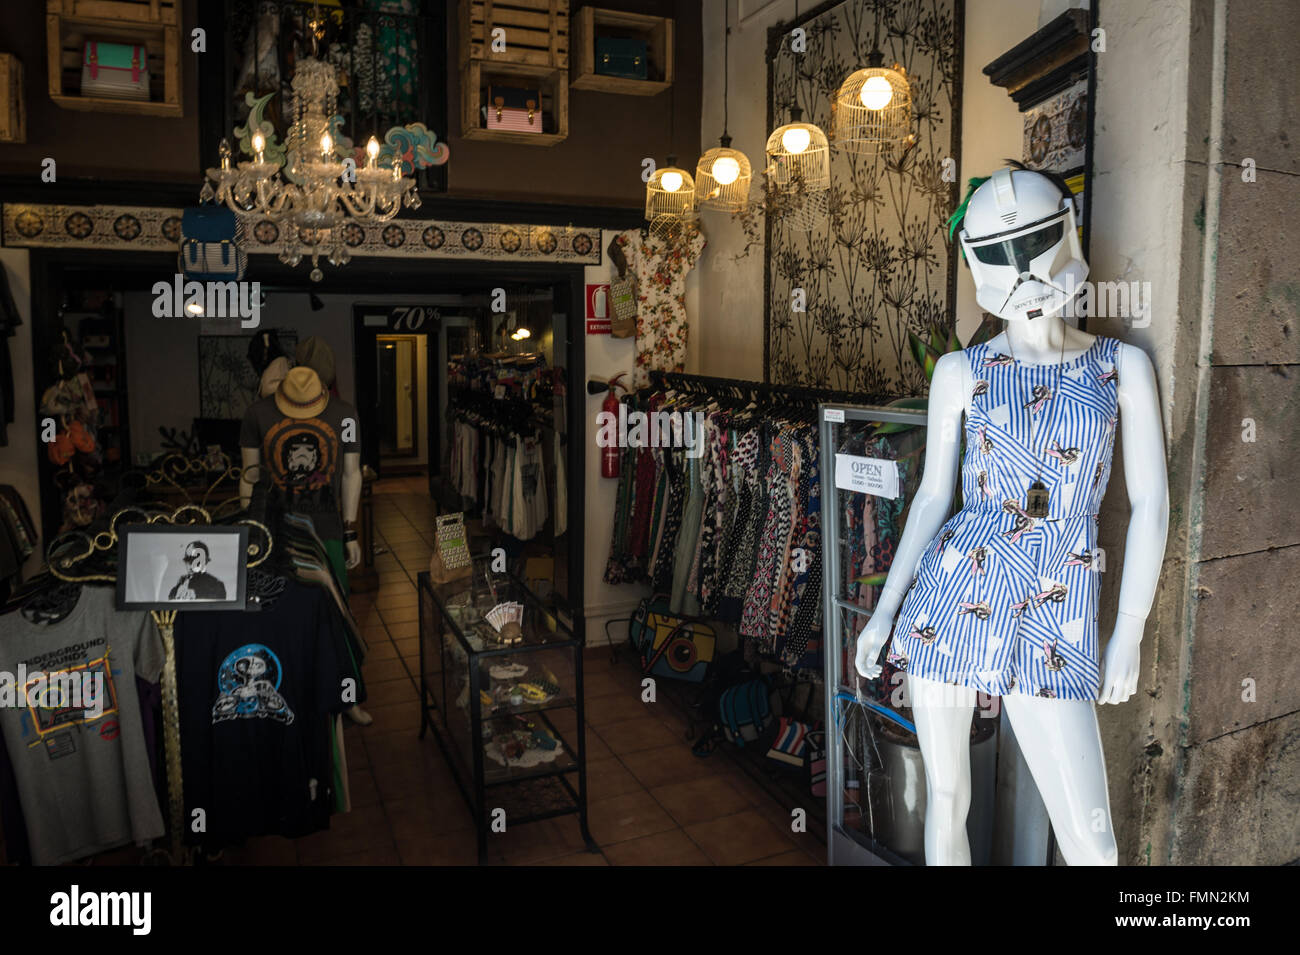 db9629990 Funny manikin in clothes shop in Barcelona, Spain Stock Photo ...